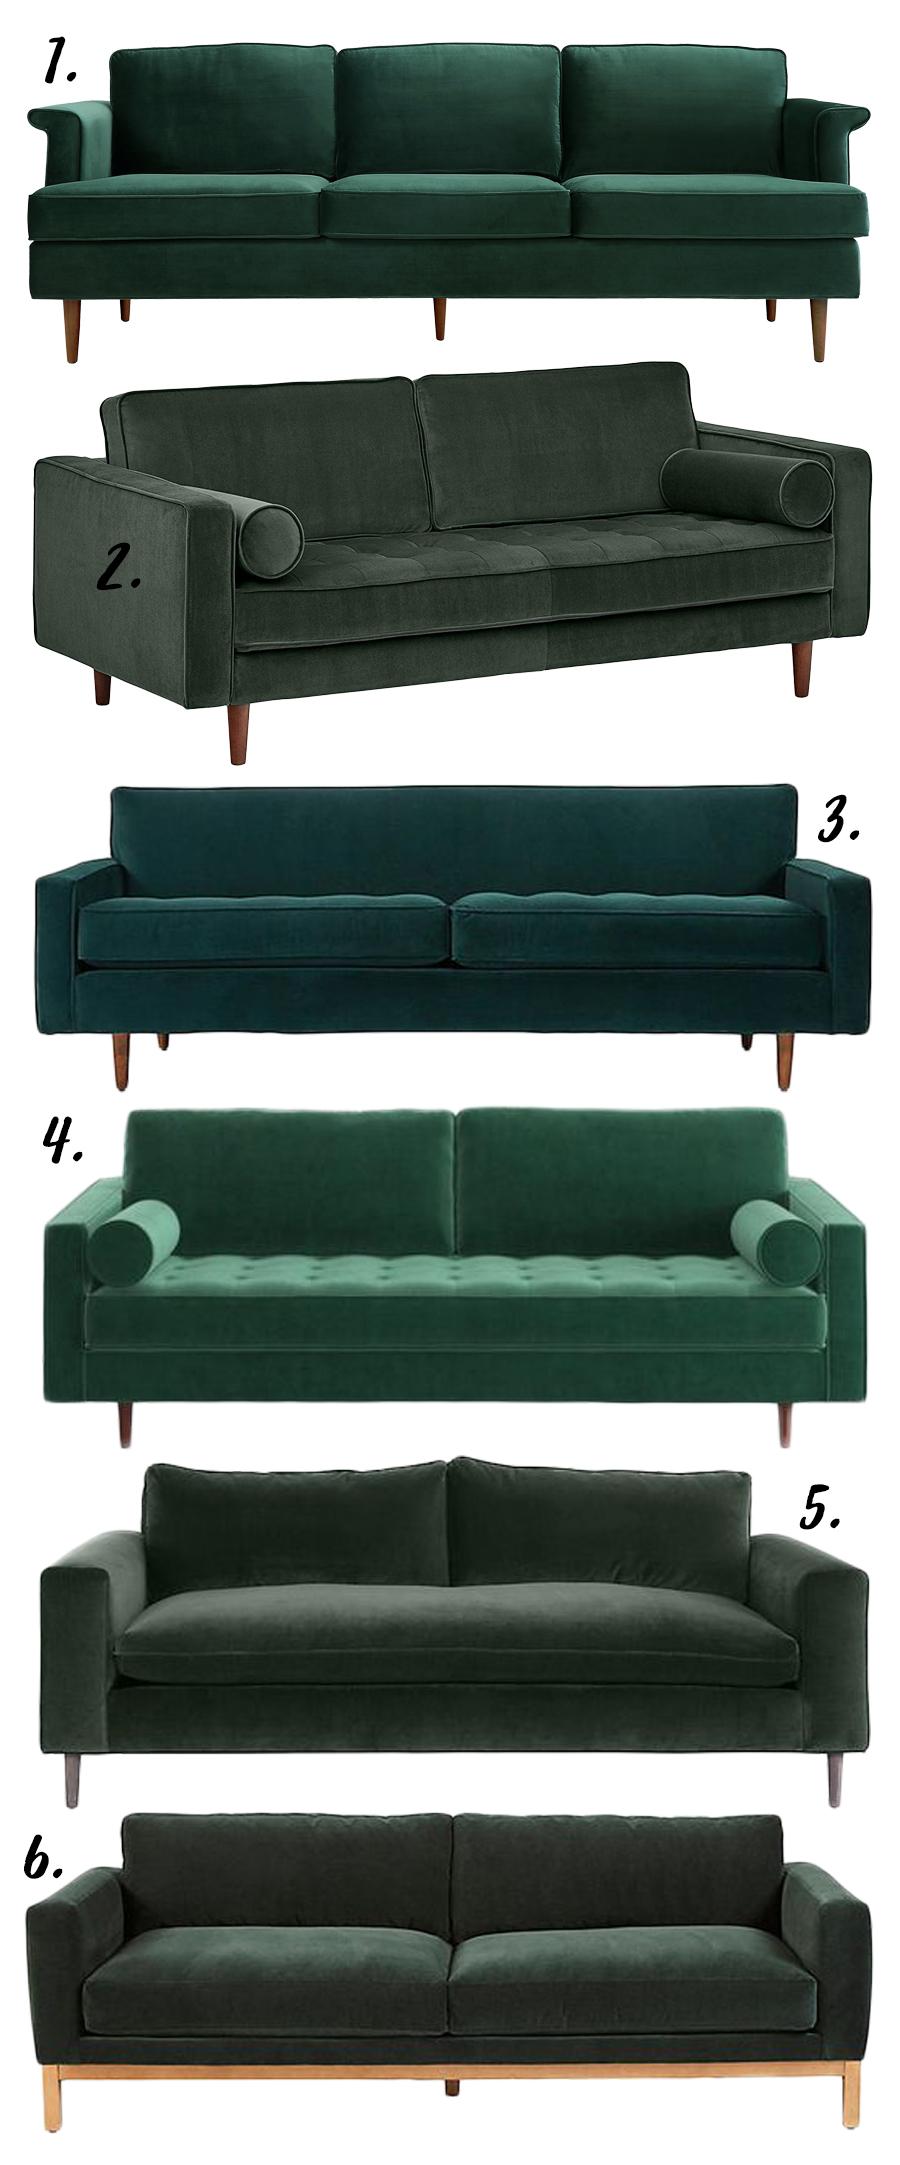 BOHO STYLE: THE GREEN VELVET SOFA - 6 STYLISH OPTIONS - Hey, Djangles. heydjangles.com - velvet green sofa, green velvet couch, green velvet sofa living room, velvet sofa green, velvet green couch, velvet couch green, boho sofa, bohemian couch, bohemian sitting room, bohemian lounge, bohemian living room, bohemian furniture, bohemian living room ideas, living room bohemian, bohemian livingroom, lounge room bohemian, shop green velvet sofas, buy green velvet sofa.